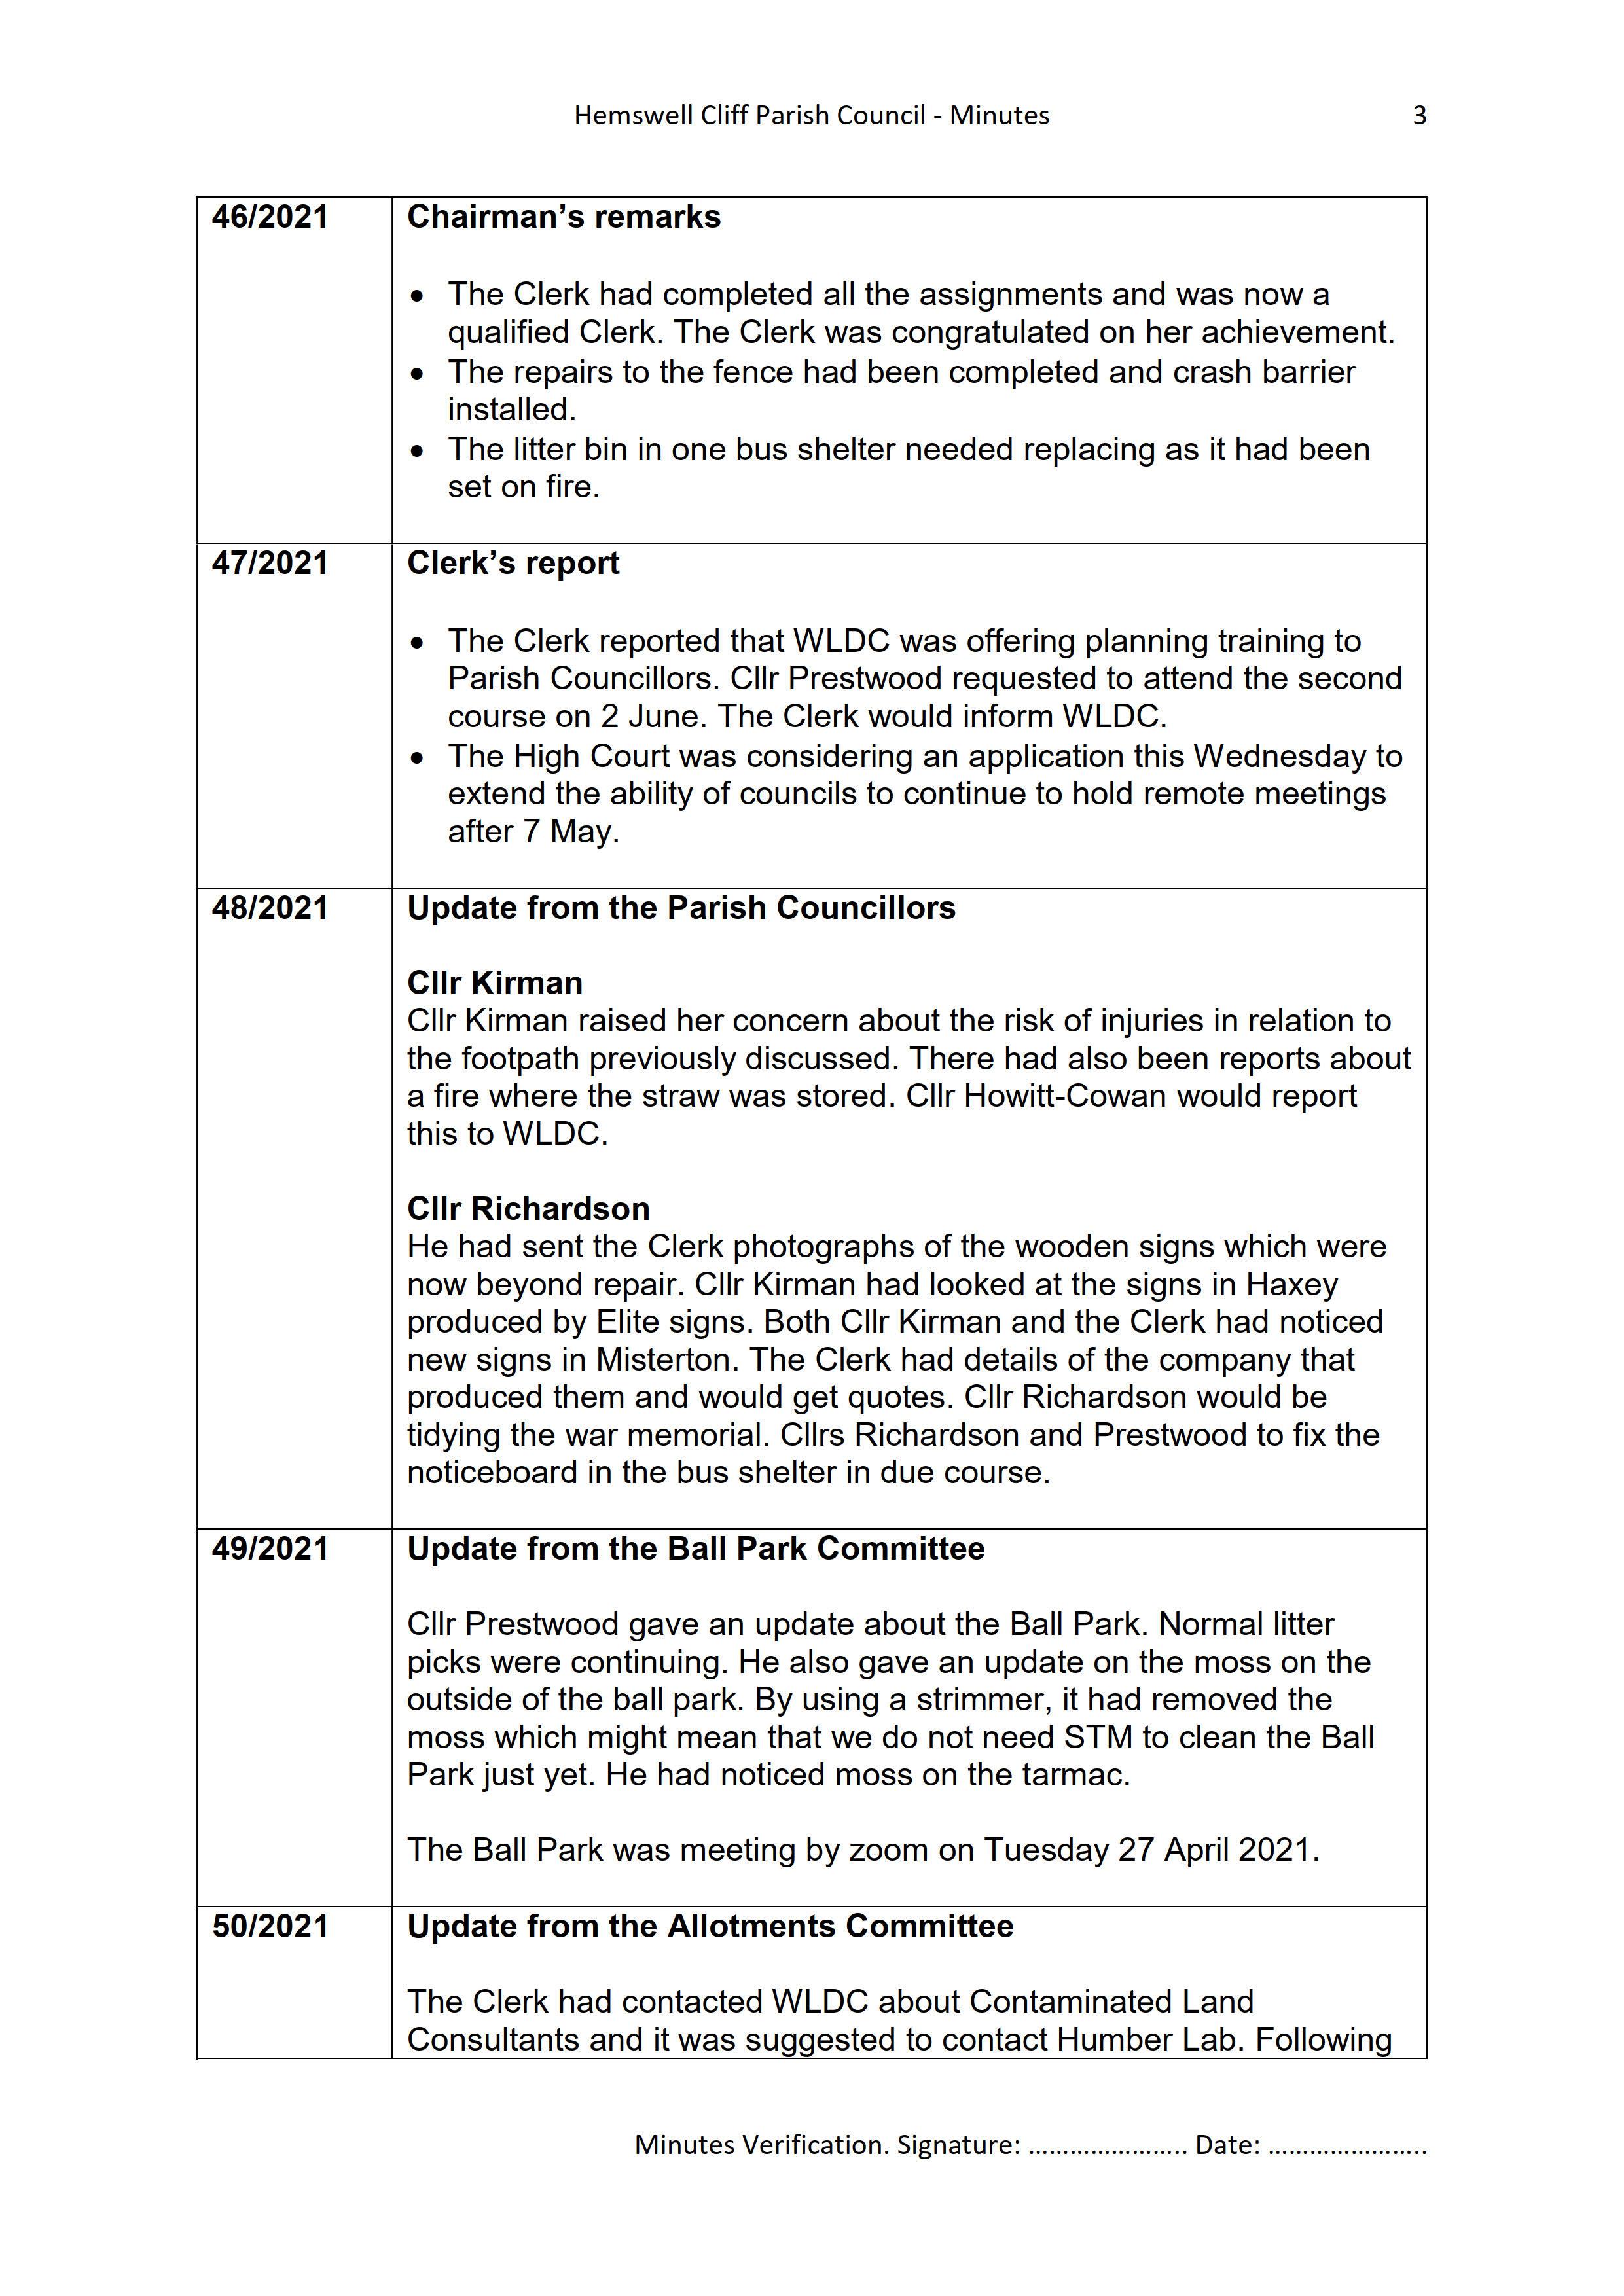 HCPC_Minutes_19.04.21_3.jpg